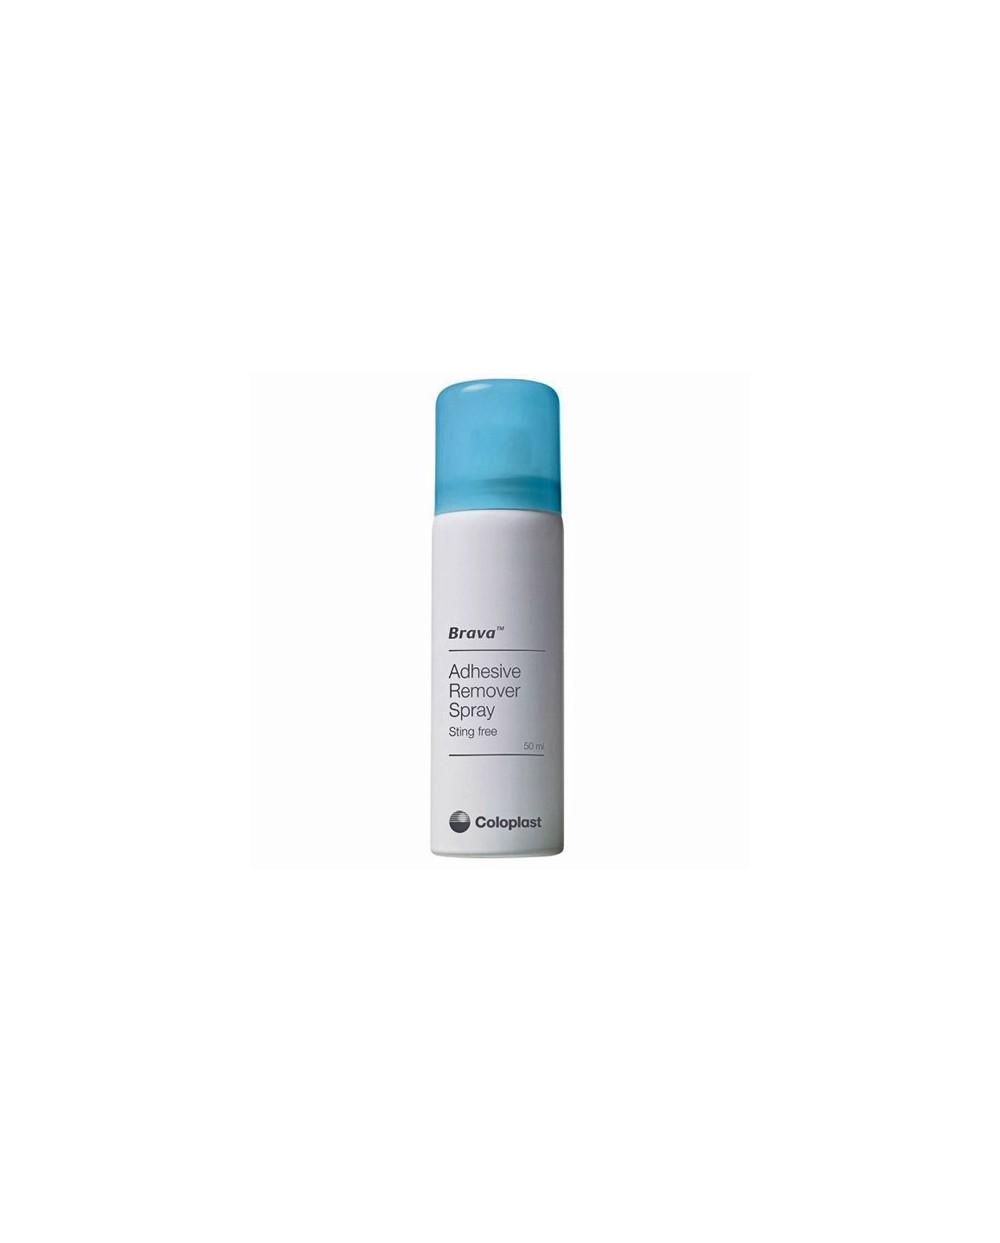 Brava Adhésive Remover Spray de 50 ml.